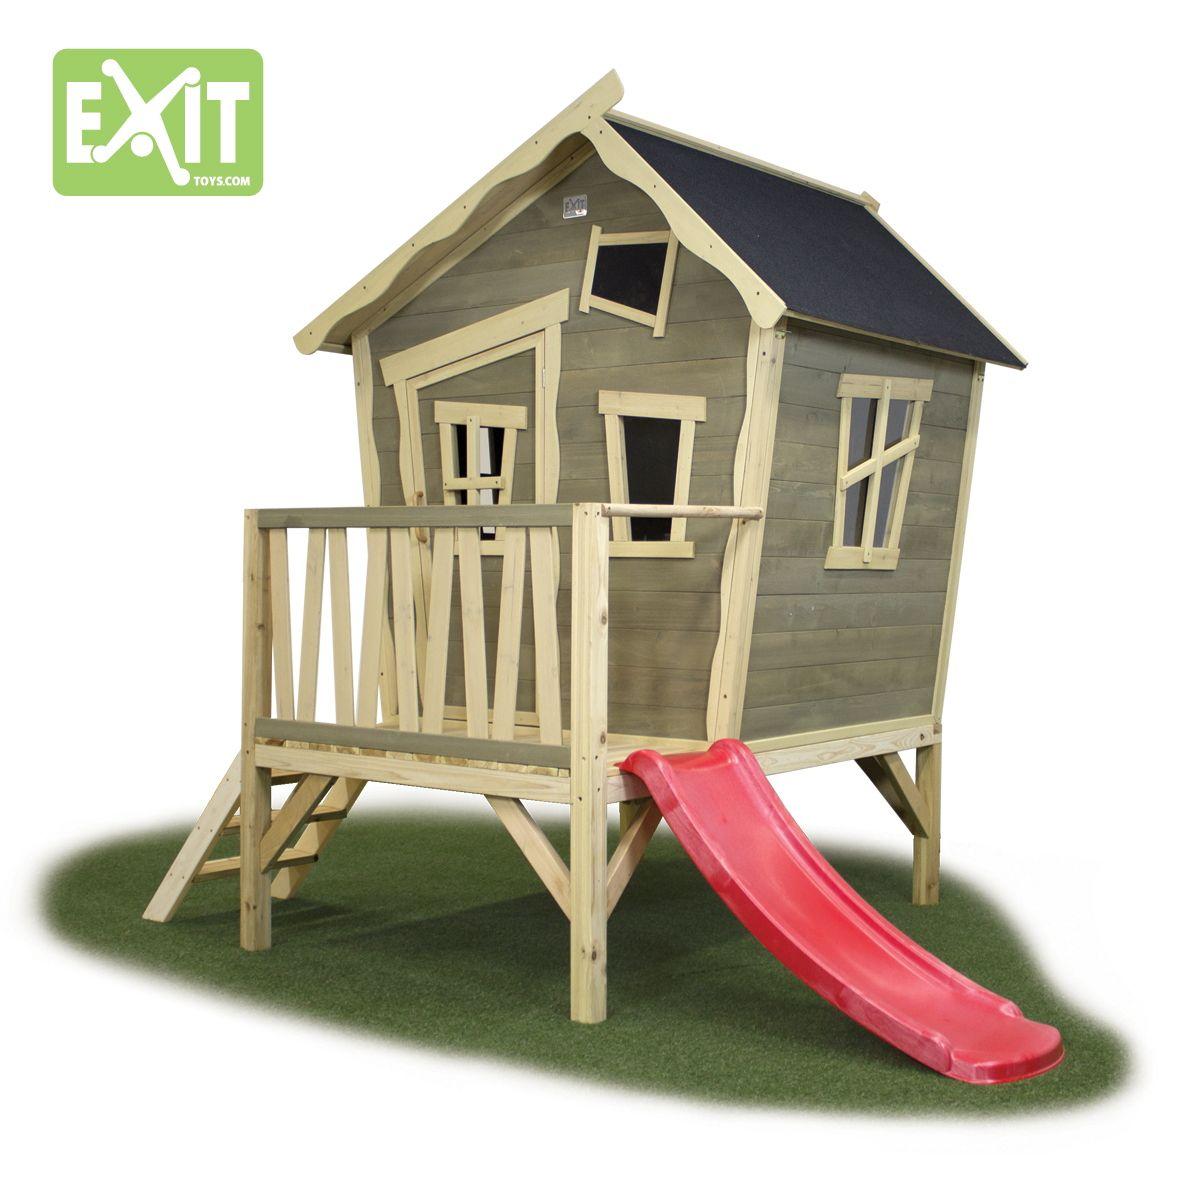 Kinder-Spielhaus EXIT «Crooky 300» Kinderspielhaus Holzhaus ...